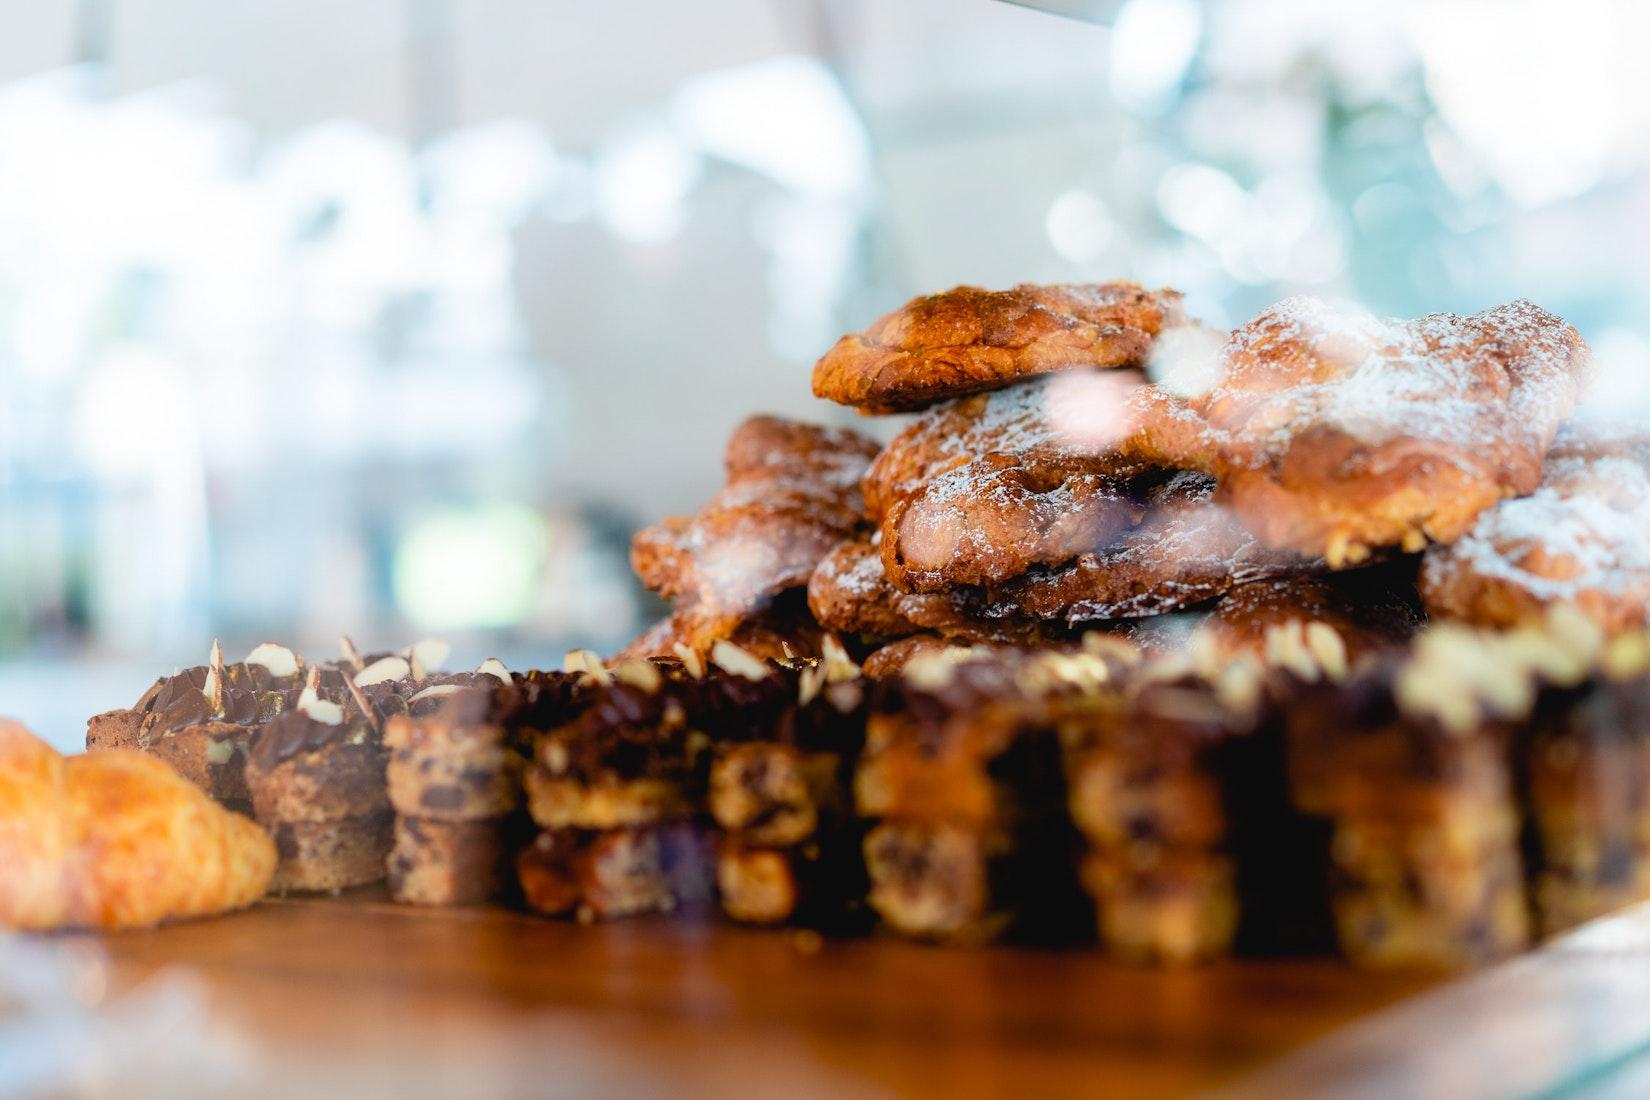 Baked goods at Azahar cafe